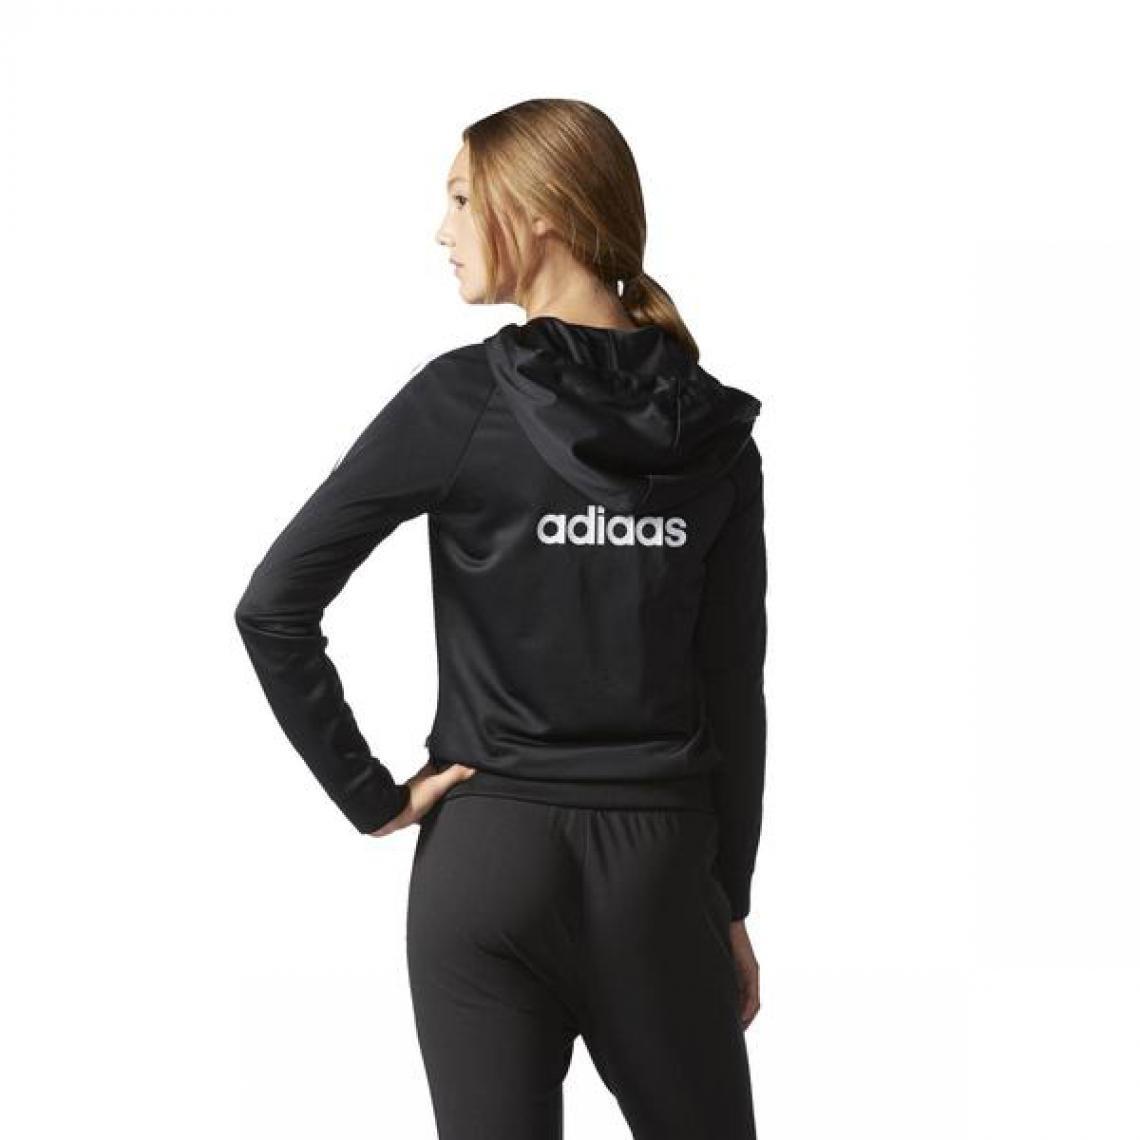 sweat adidas femme 3 bandes